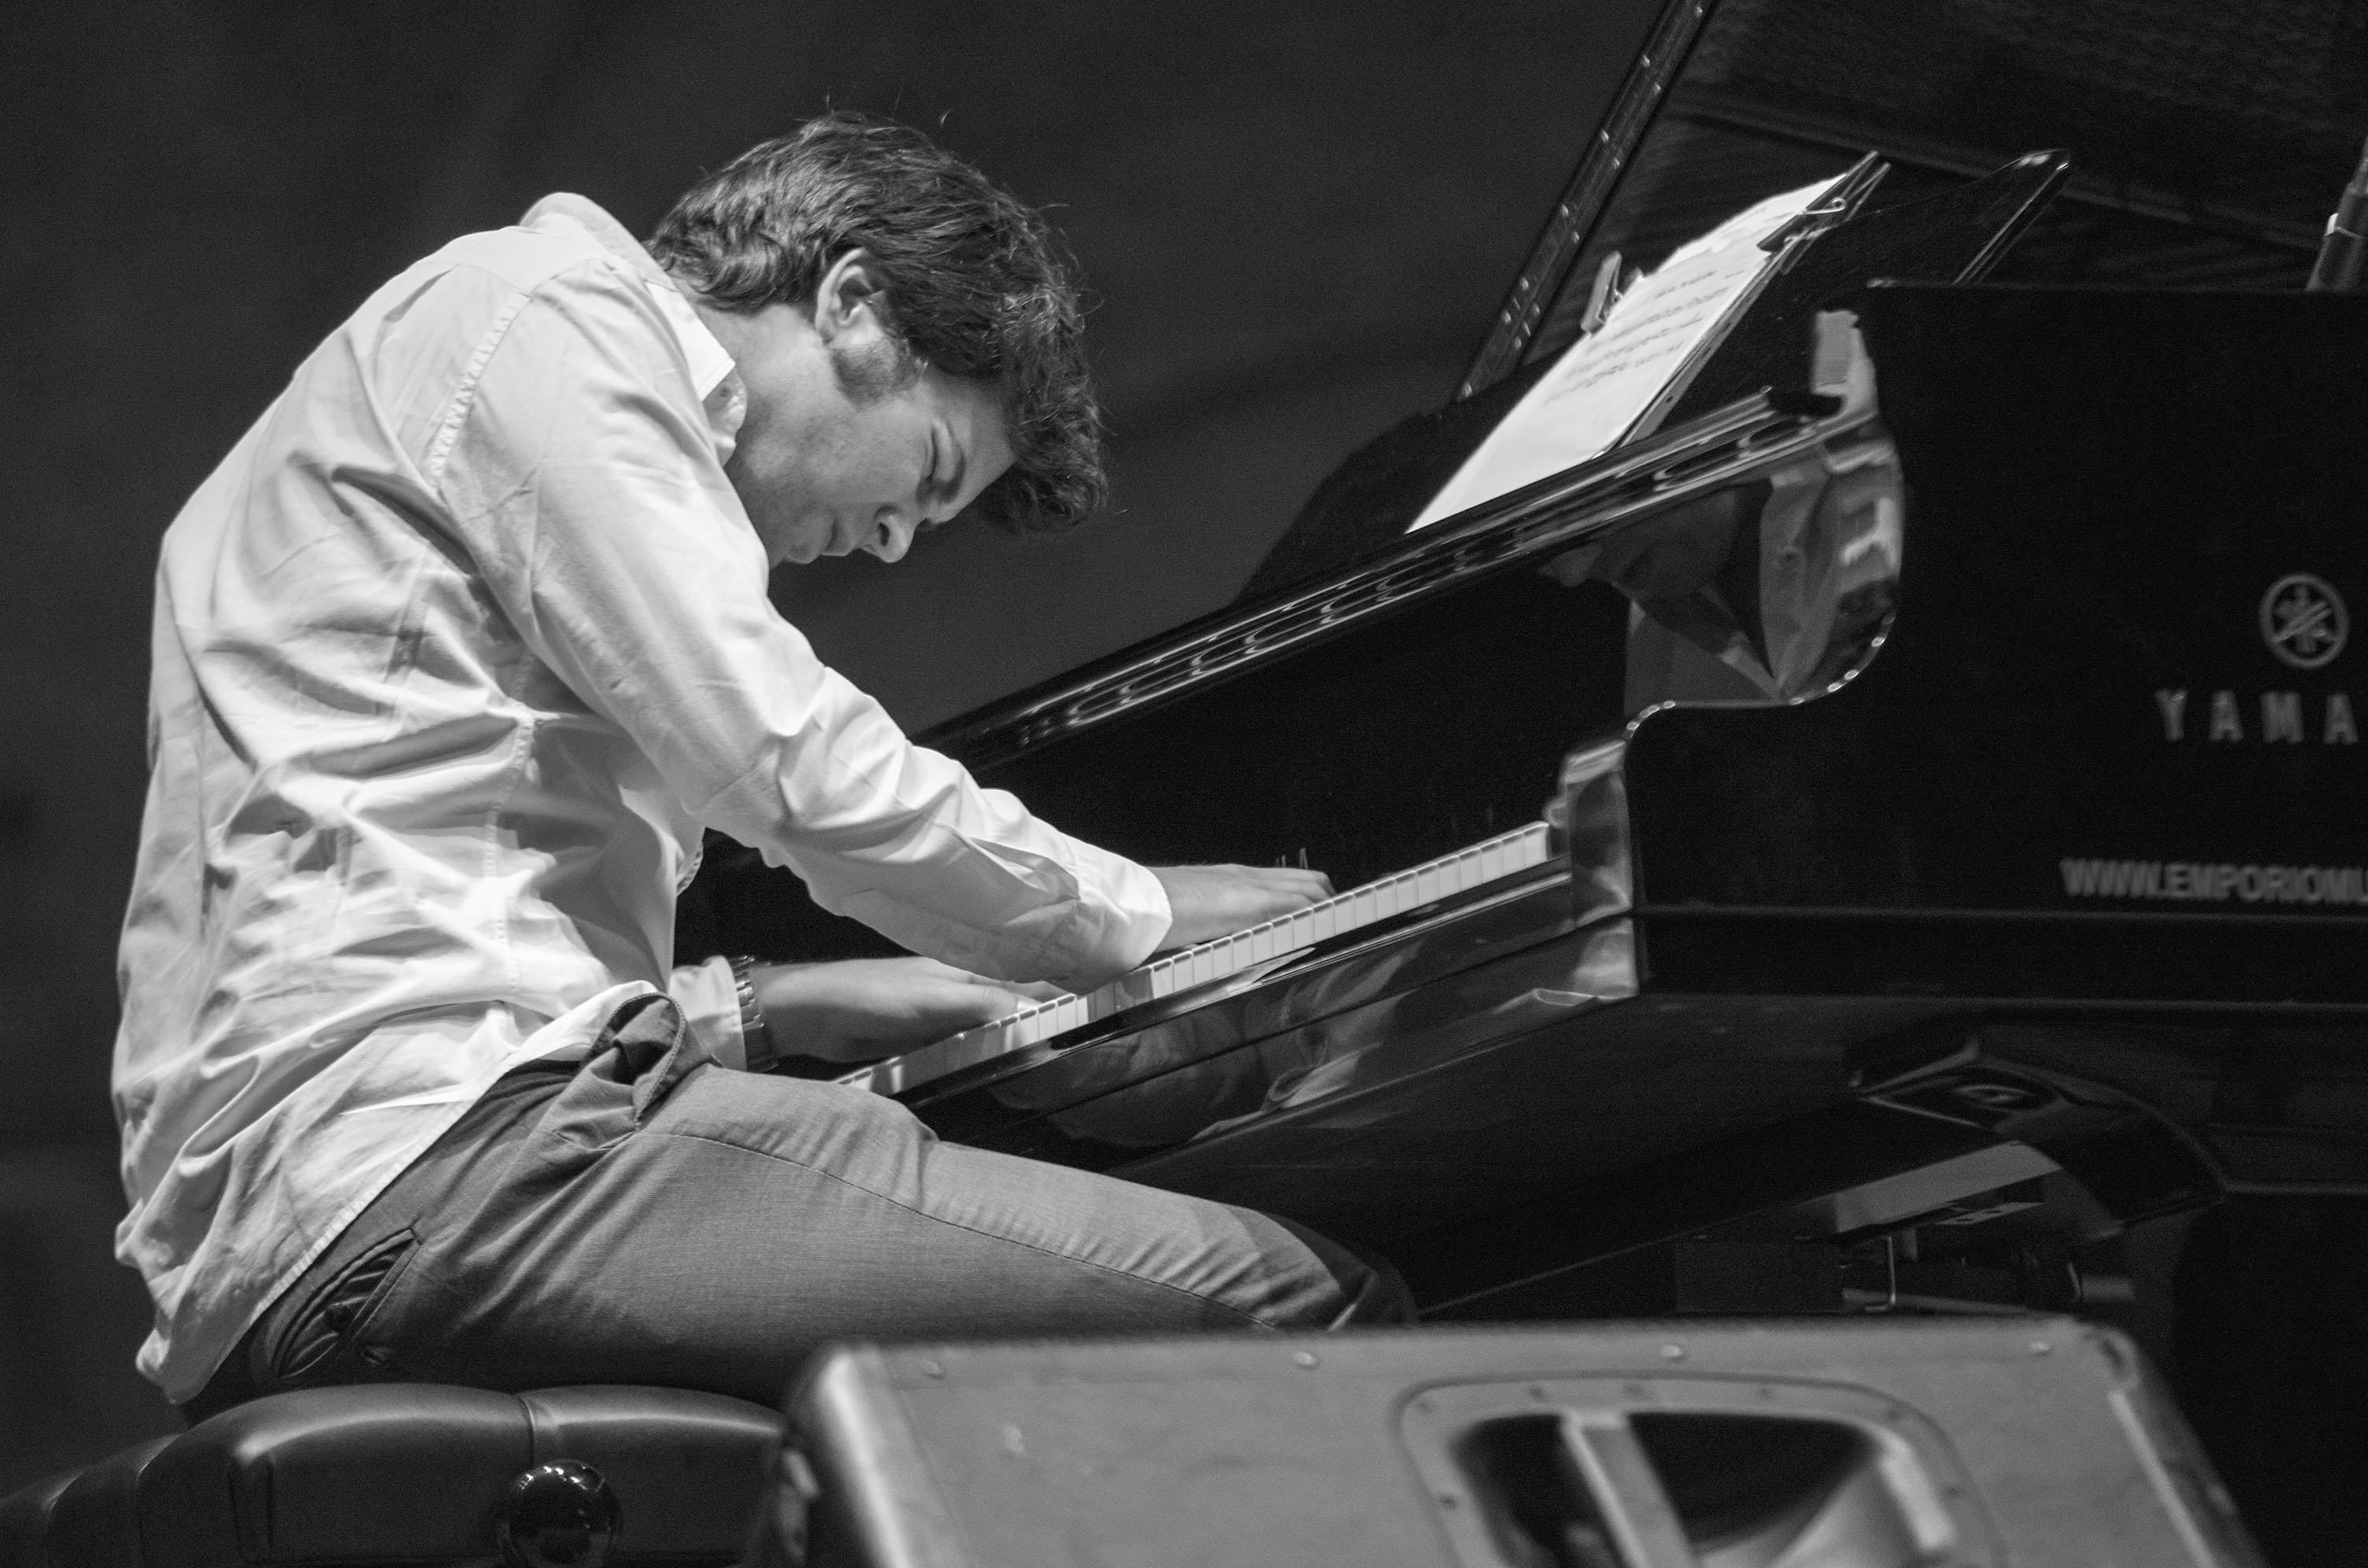 Alessandro lanzoni, 2013 siena jazz academy summer workshop